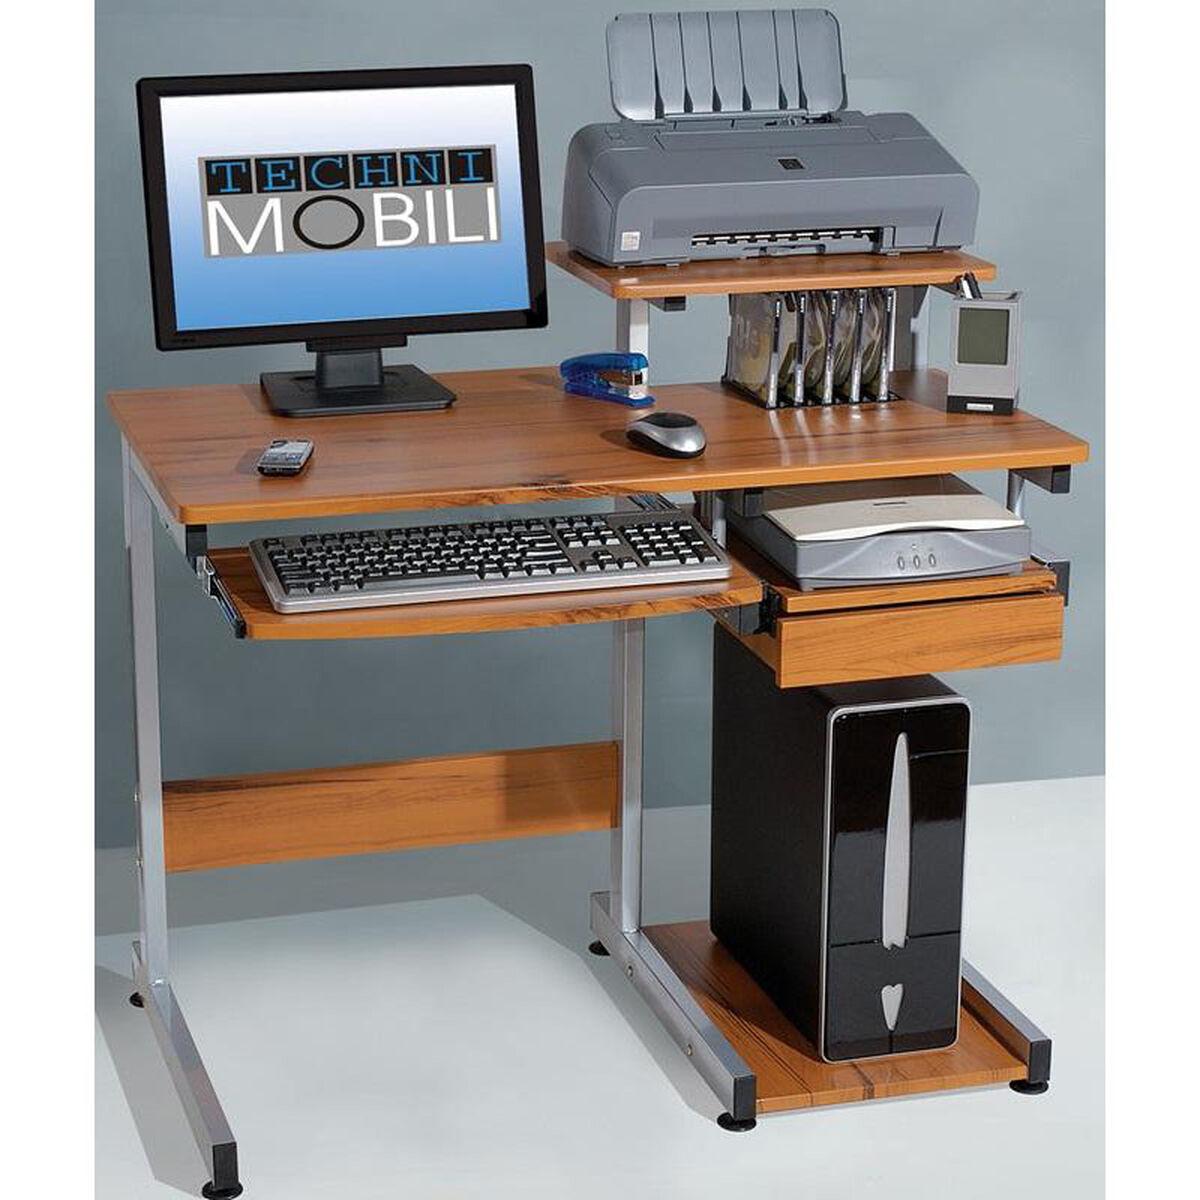 Rta Products Techni Mobili Multifunction Computer Desk